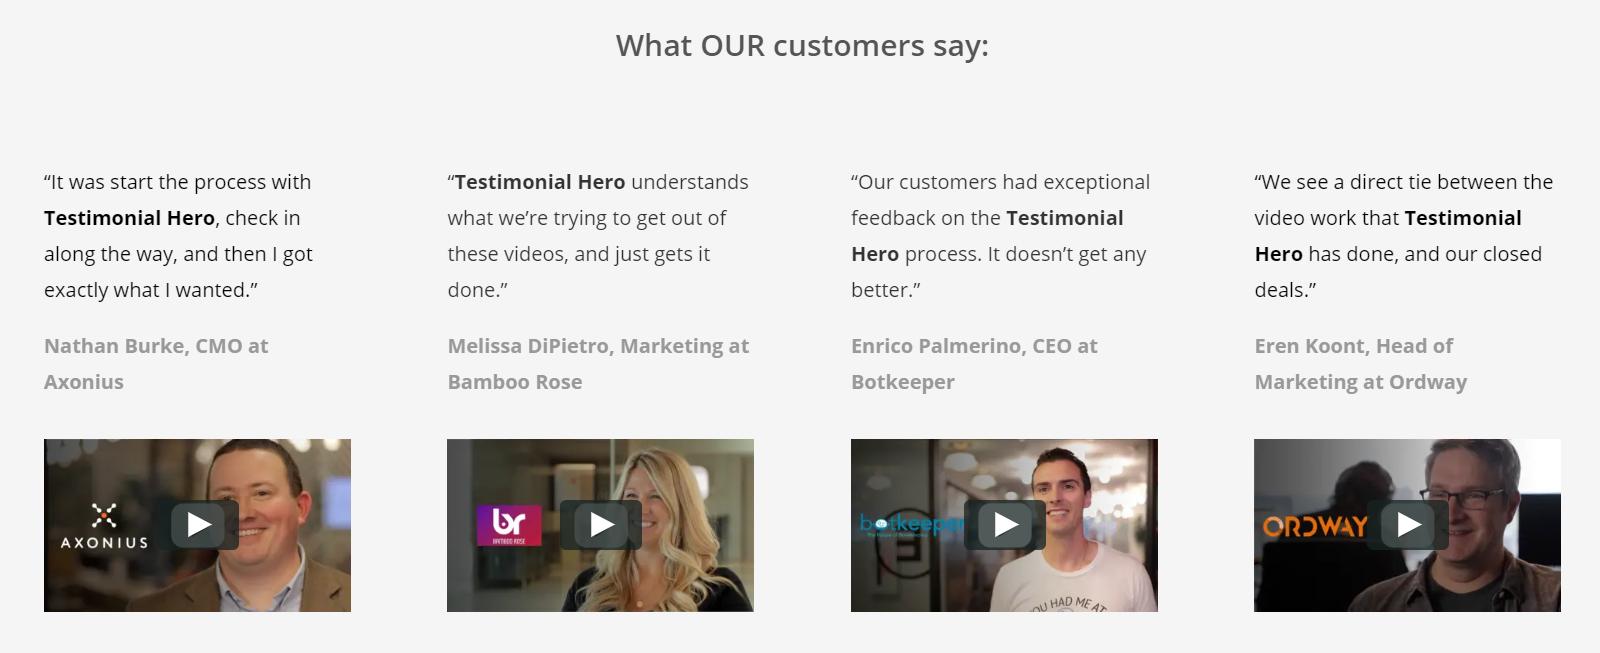 Testimonial Hero shows B2B customer testimonial videos.